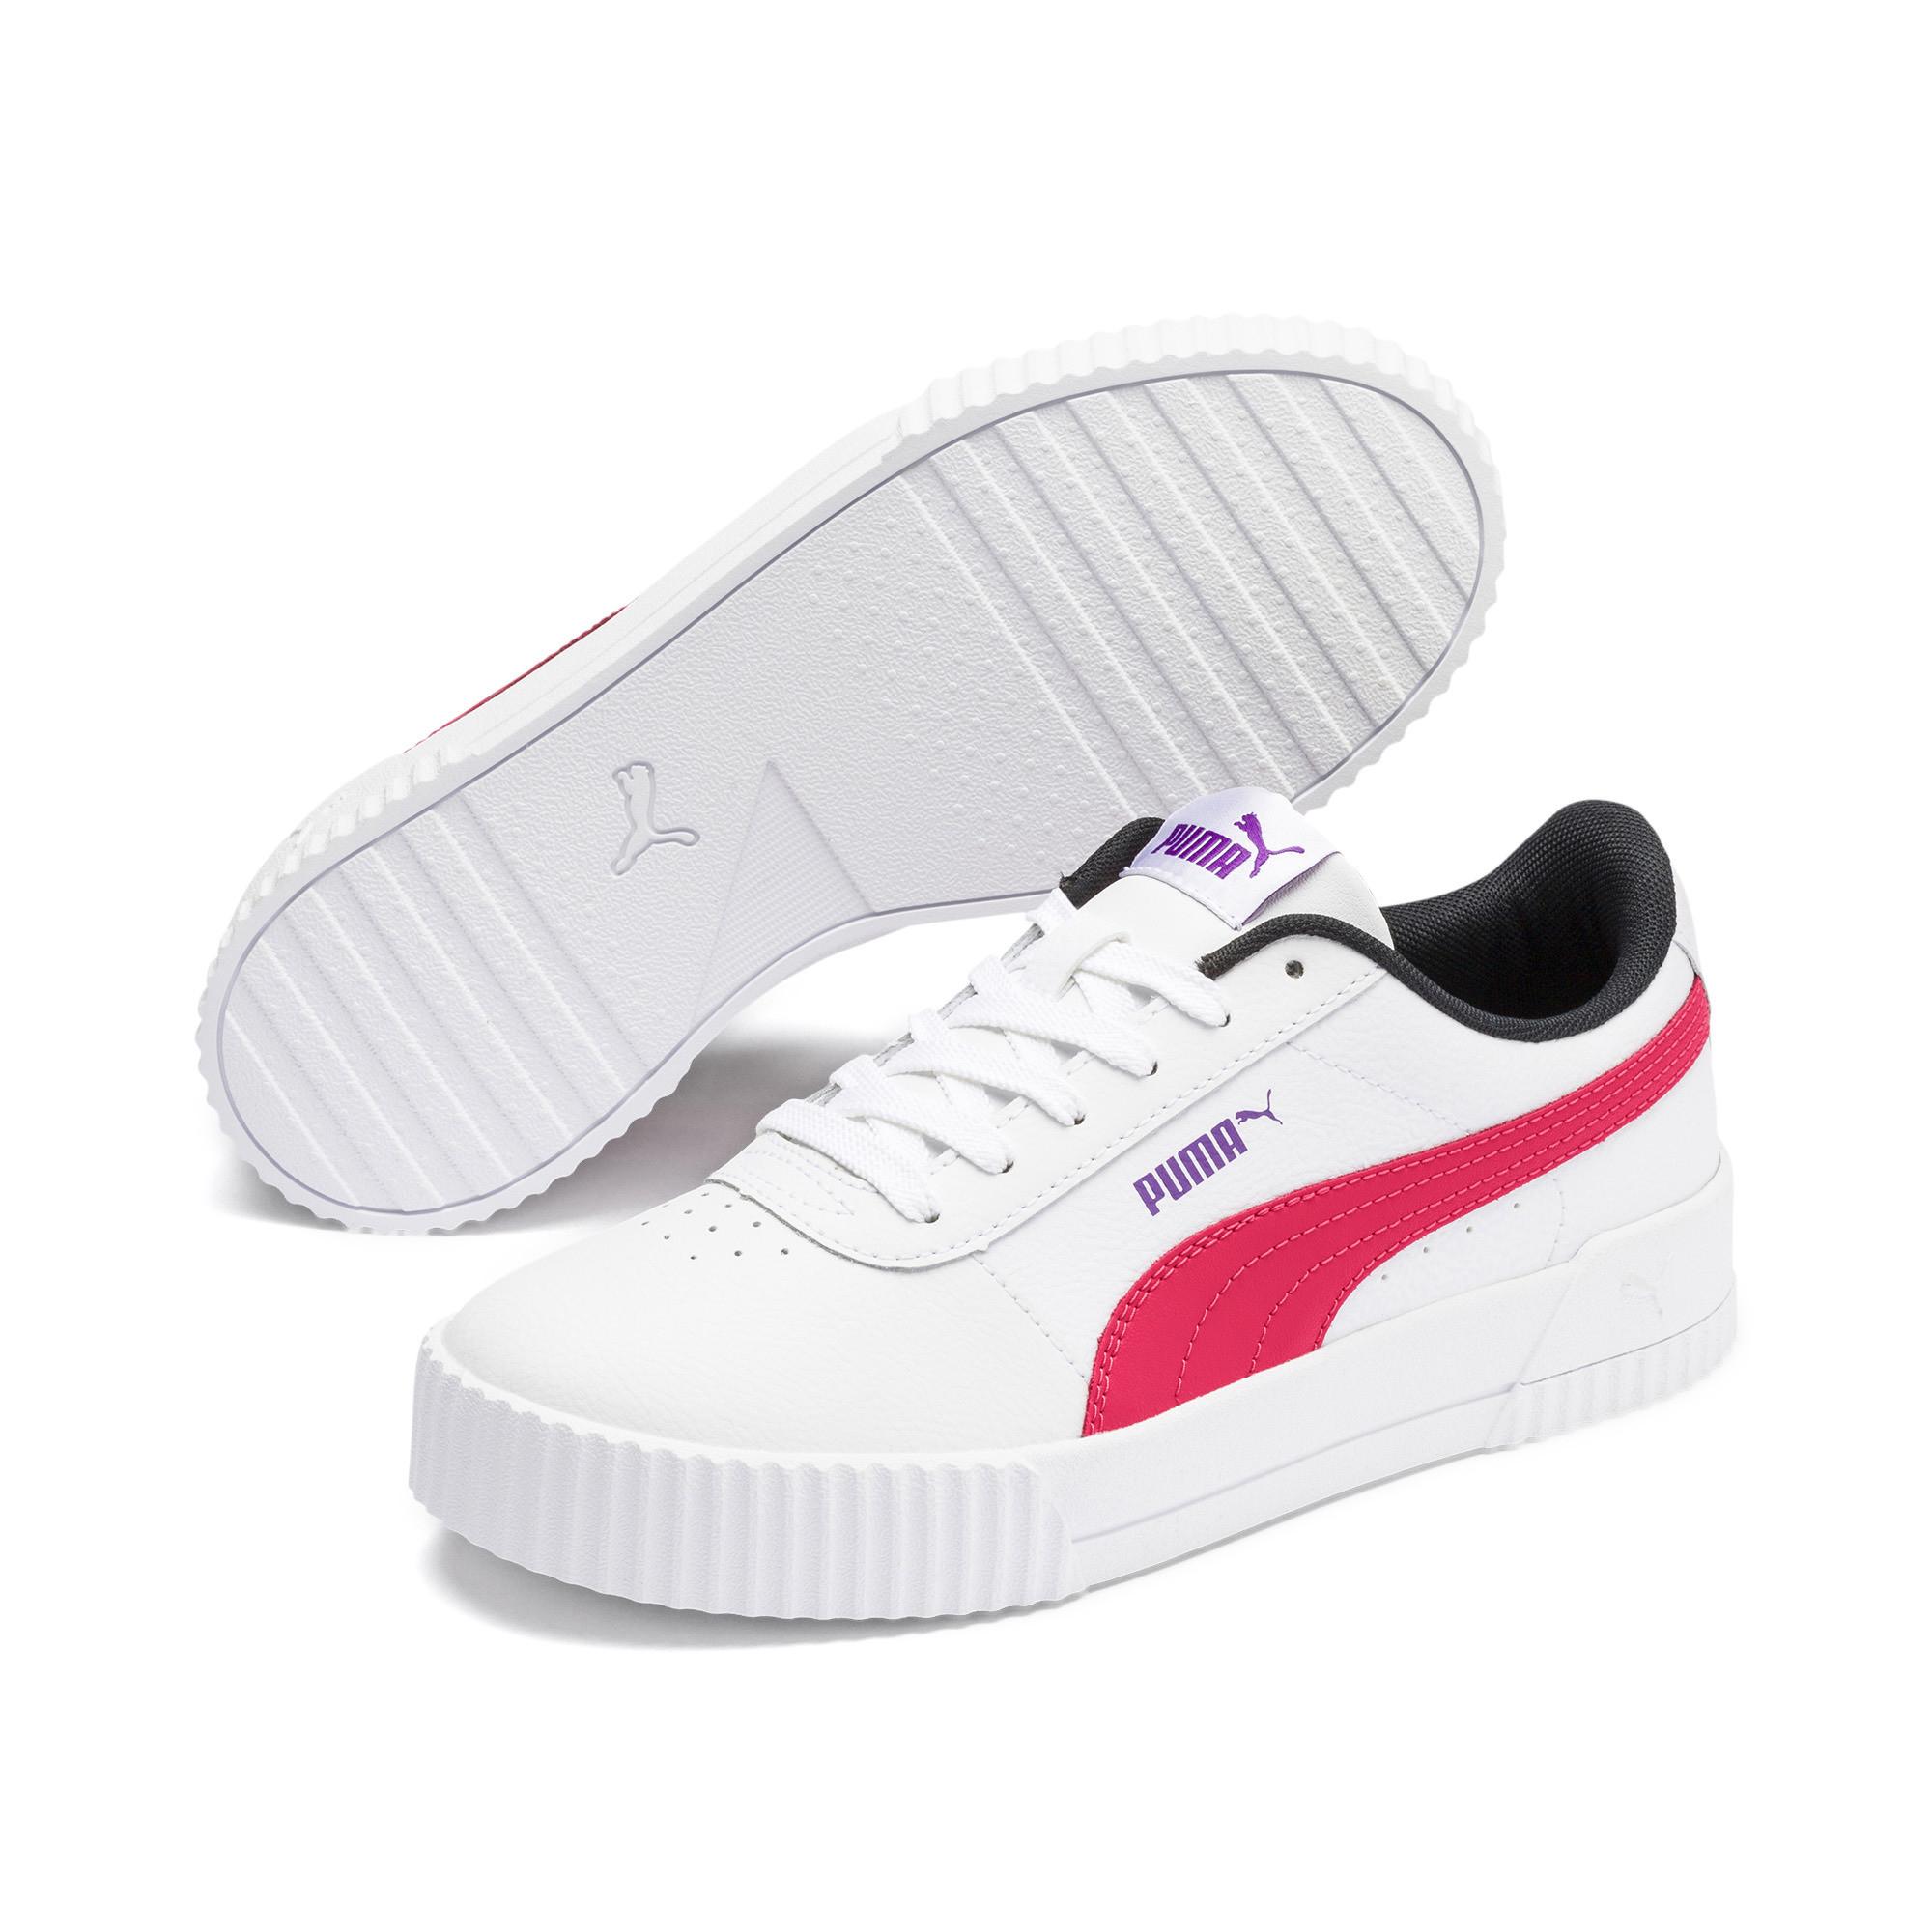 Details about PUMA Carina Leather Women's Sneakers Women Shoe Basics